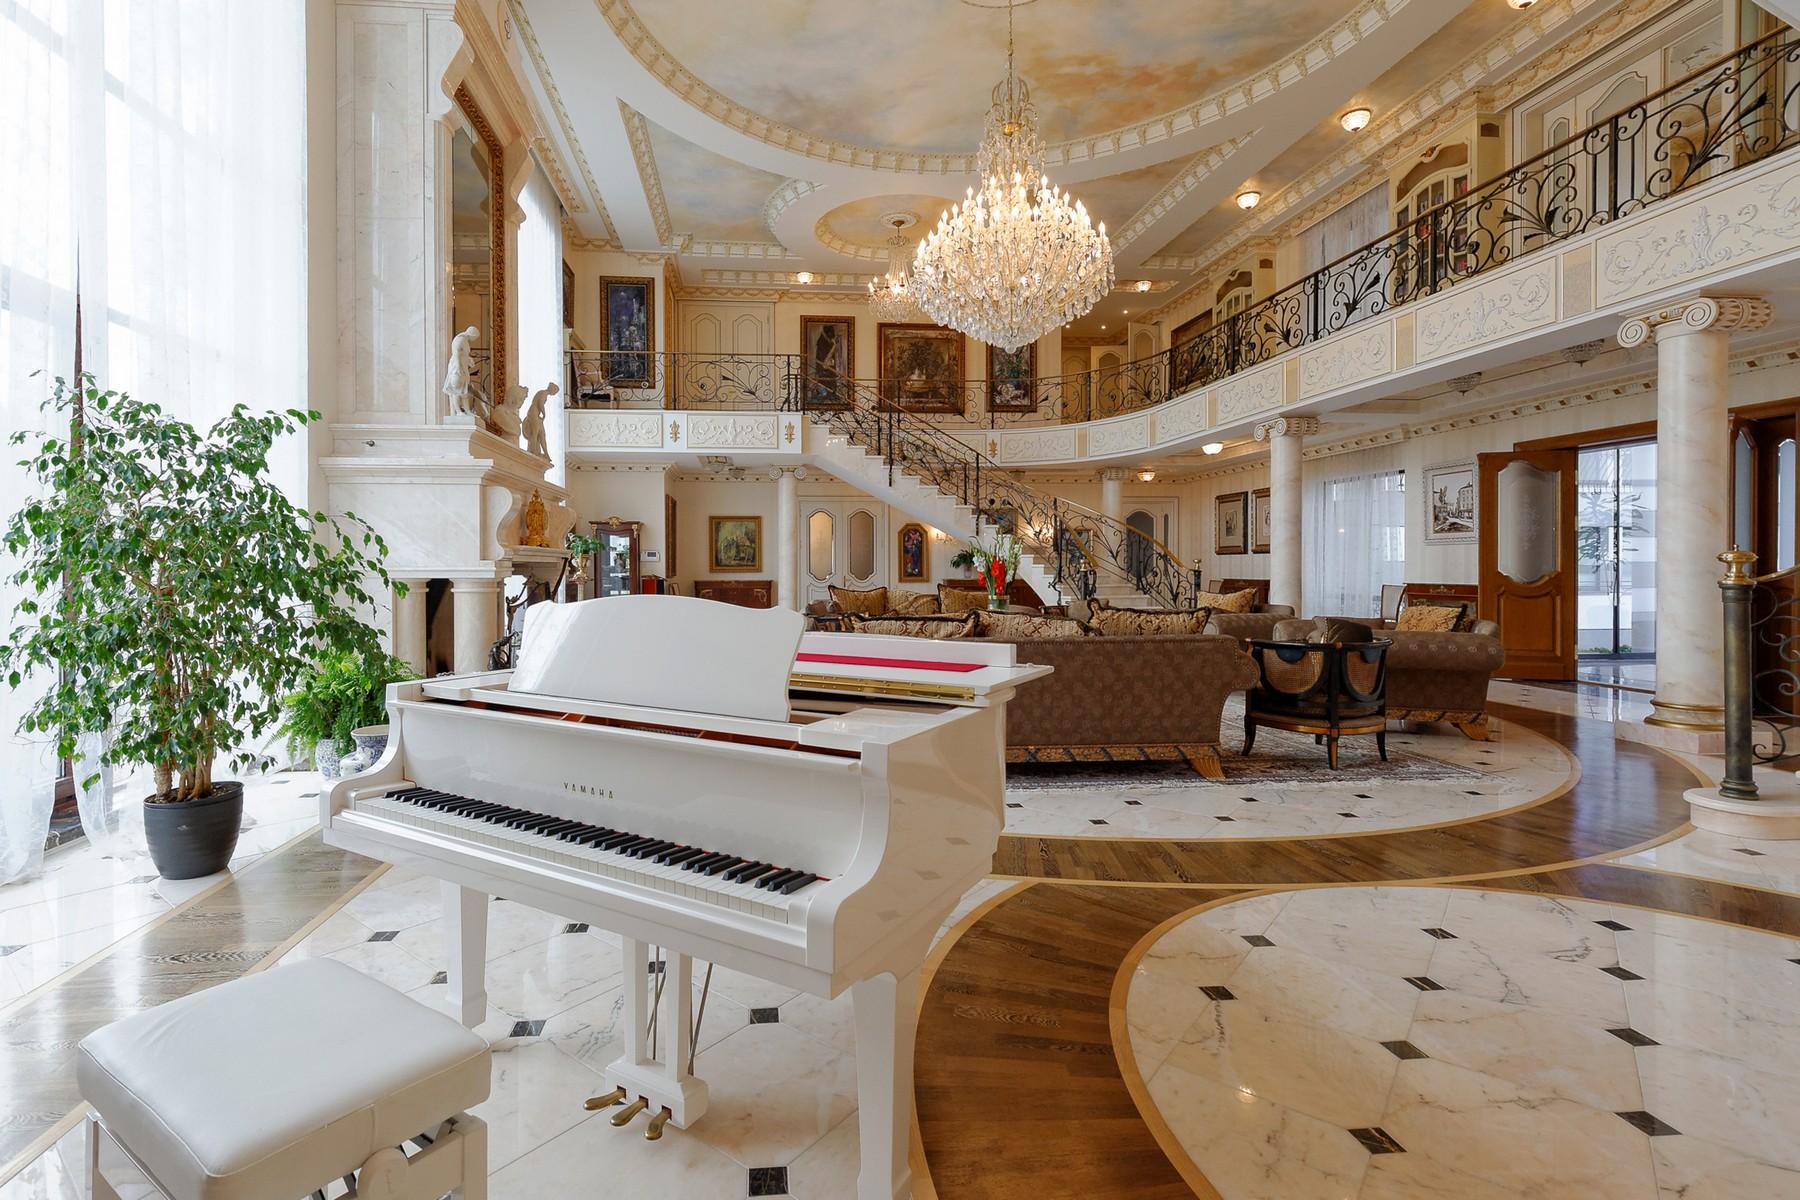 sales property at Luxury residence Villa Margarita in the resort city Jurmala